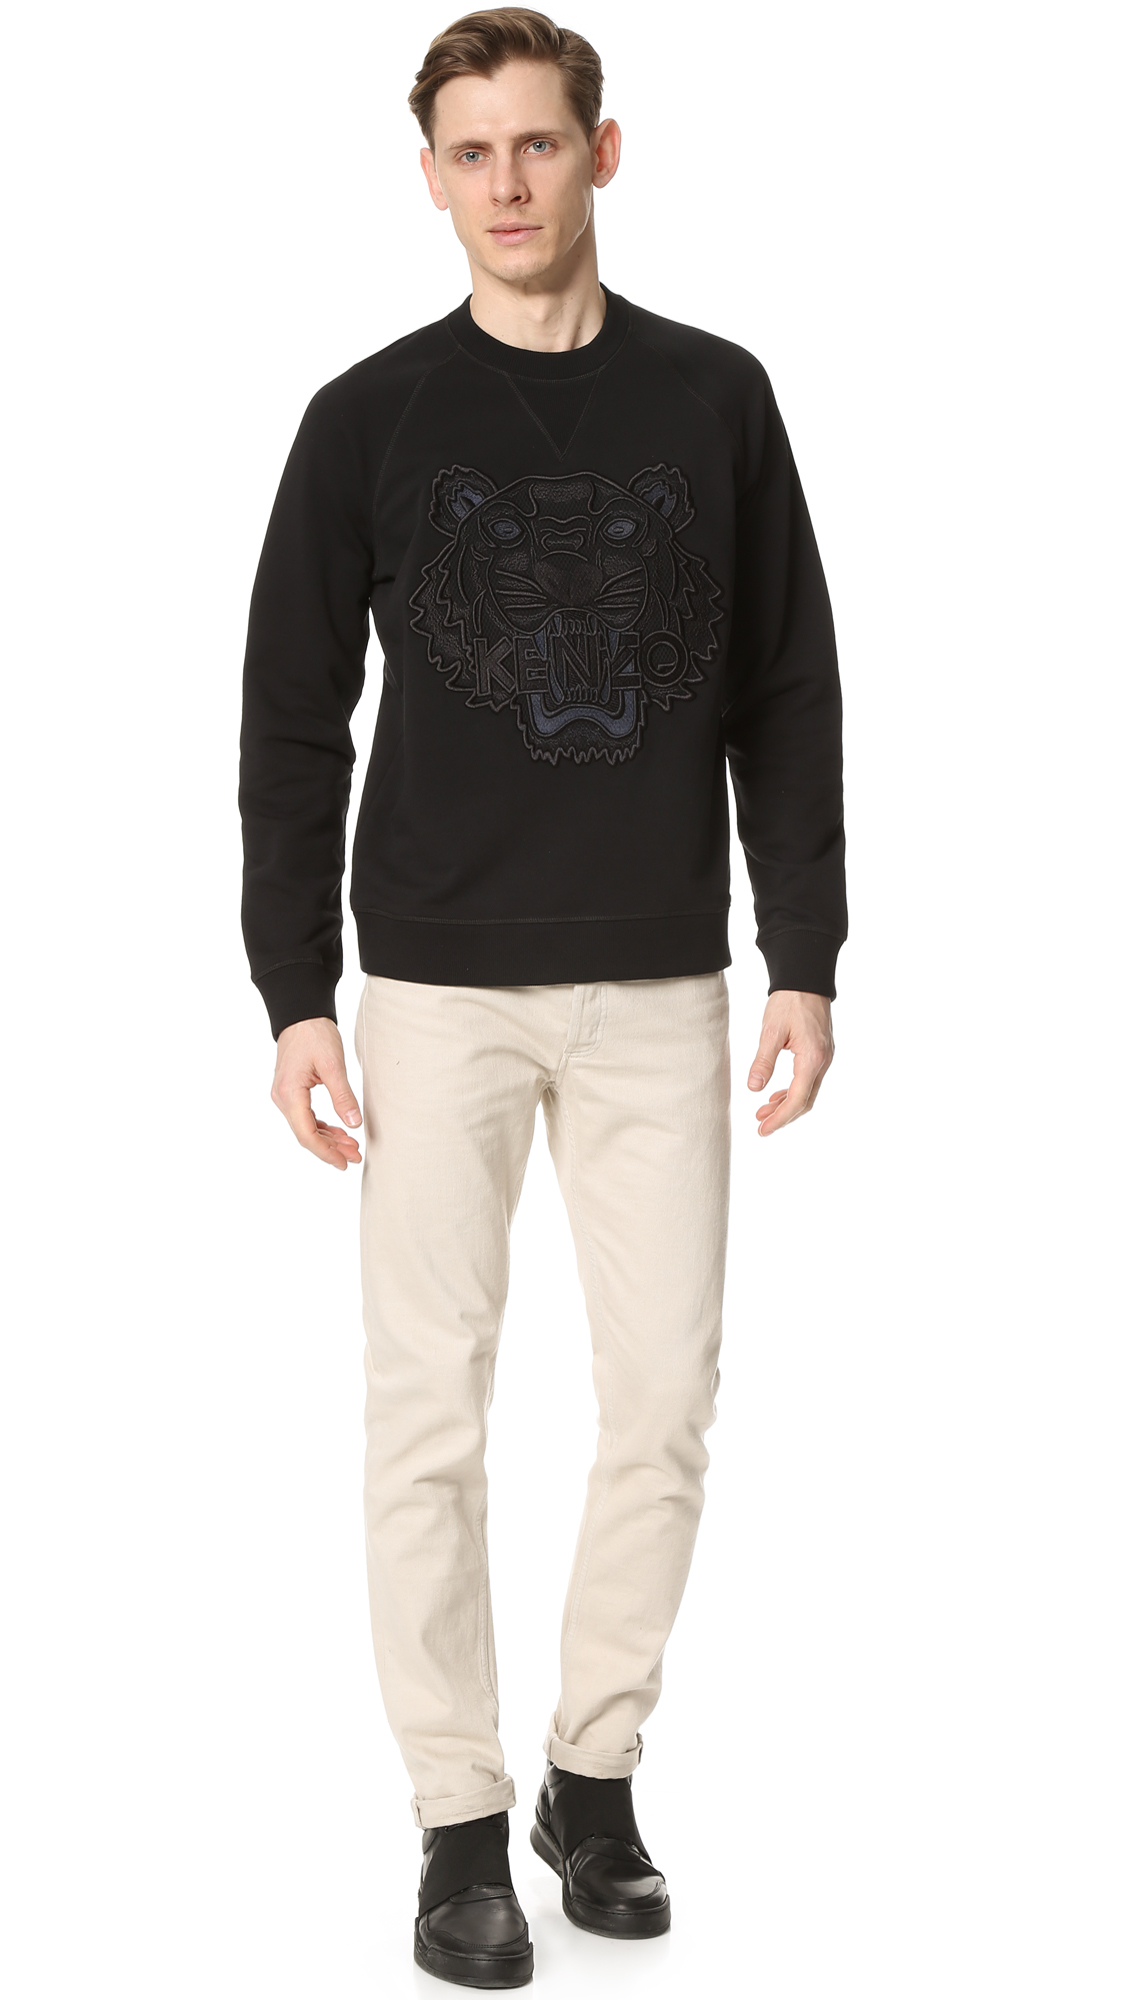 Mesh SweatshirtEast Kenzo Tiger Raglan Dane XZkiPu